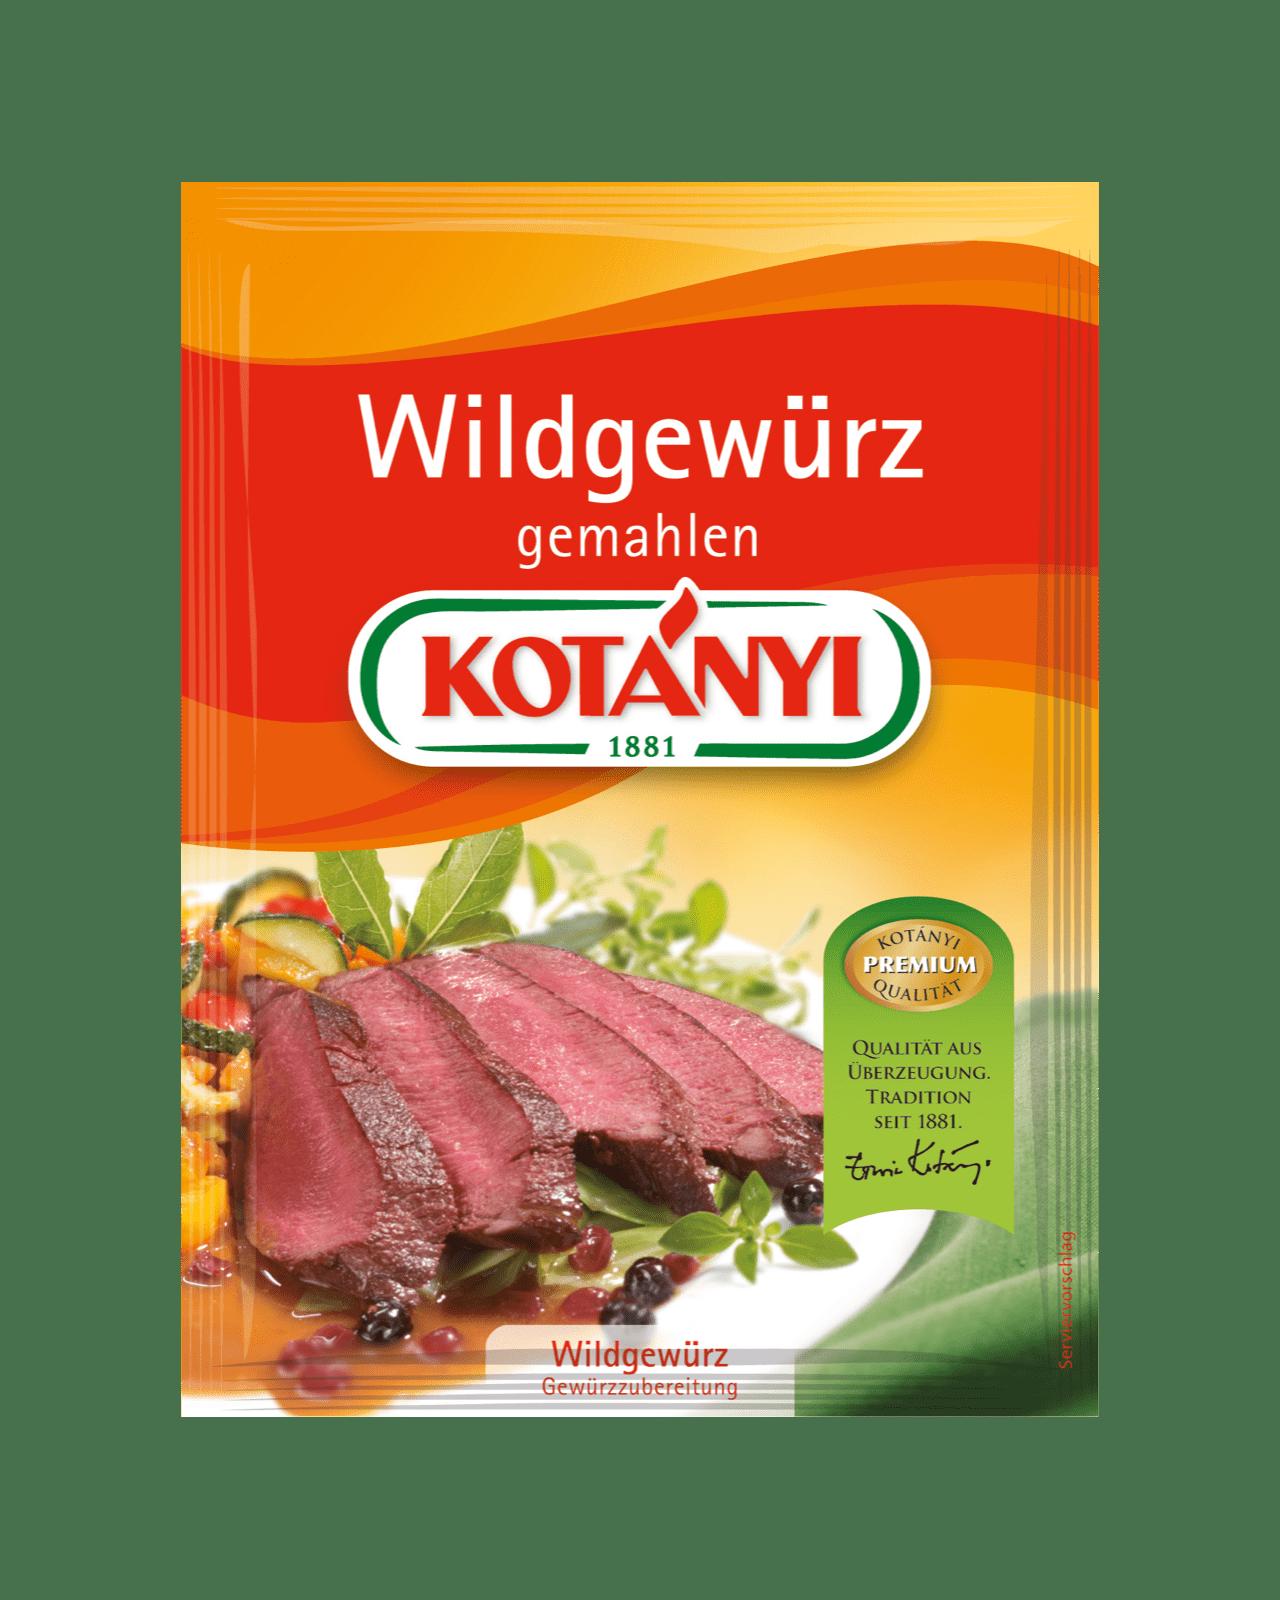 Kotányi Wildgewürz gemahlen im Brief